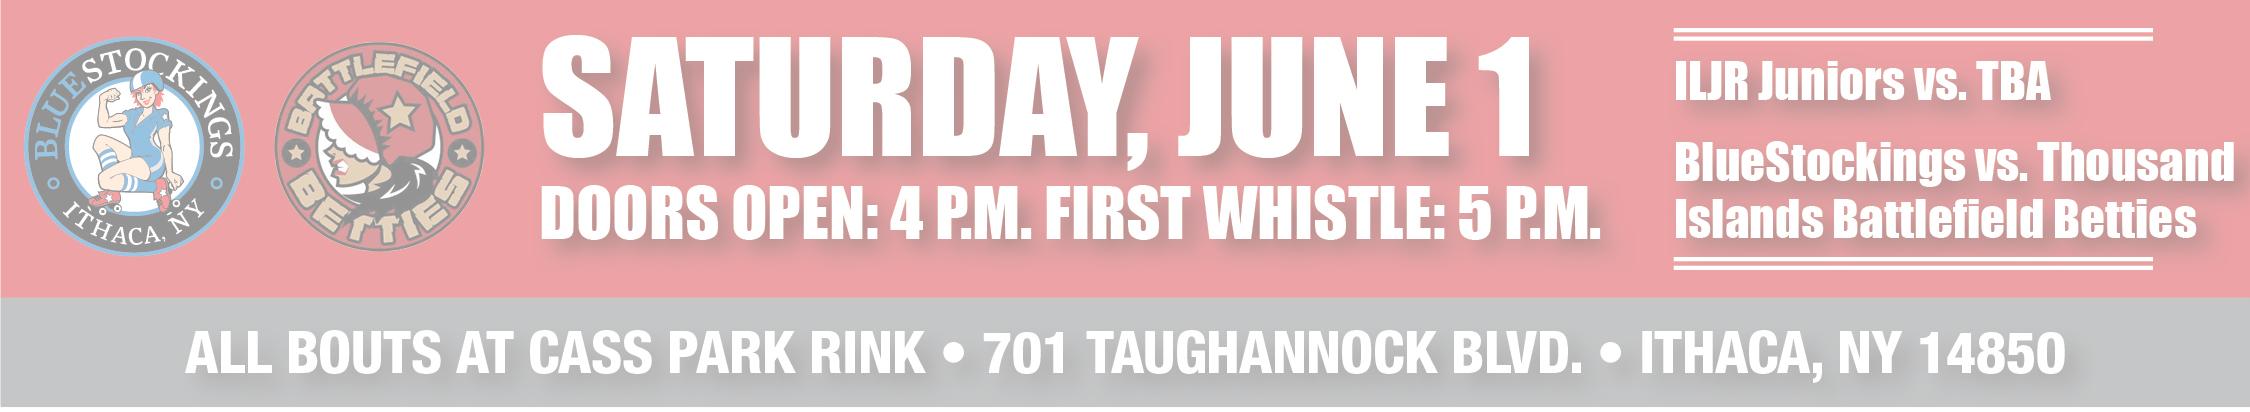 Saturday, June 1